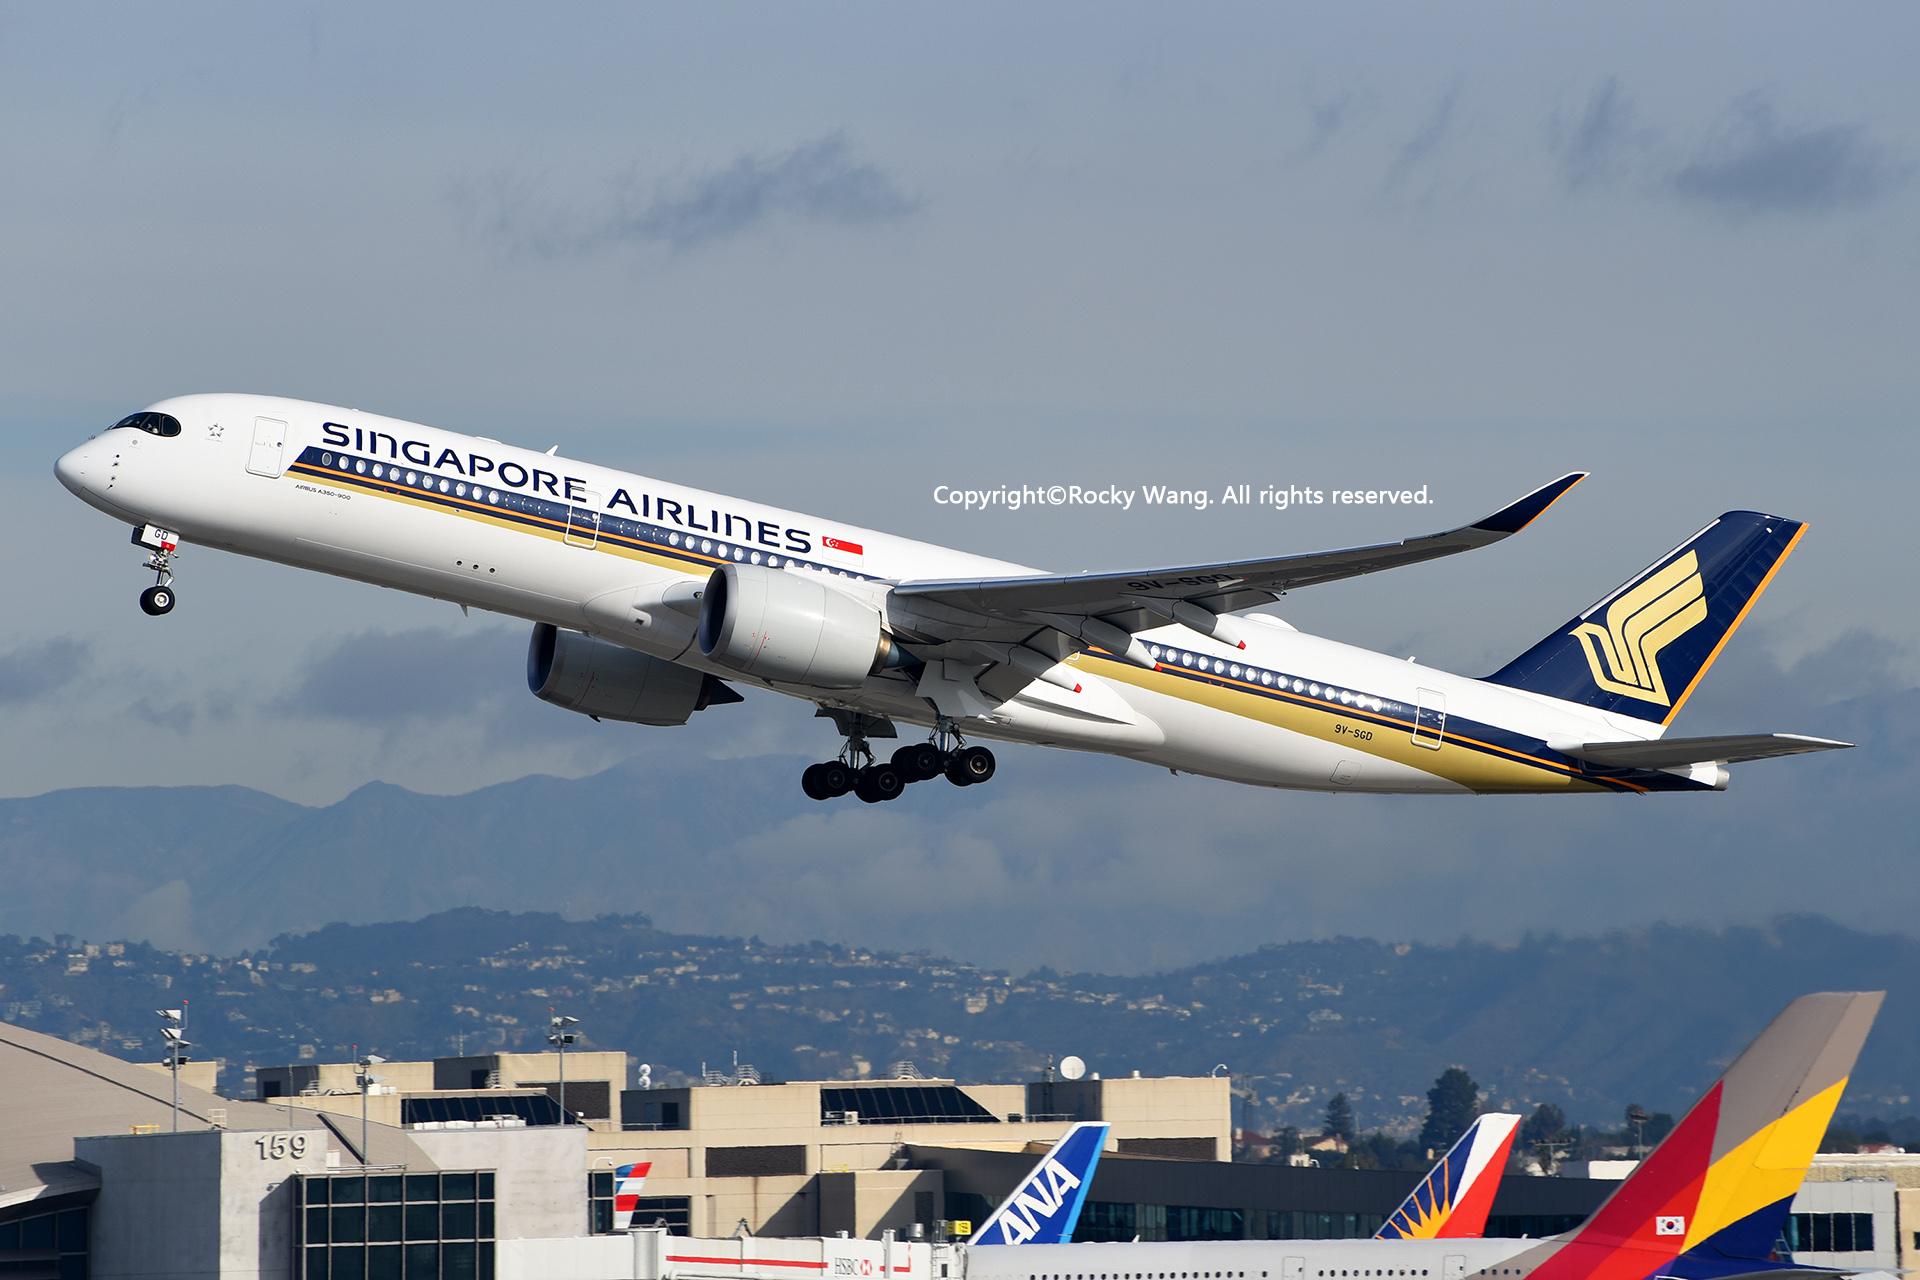 Re:[原创]随便来一组 不凑30图了 AIRBUS A350-941 9V-SGD Los Angeles Int'l Airport